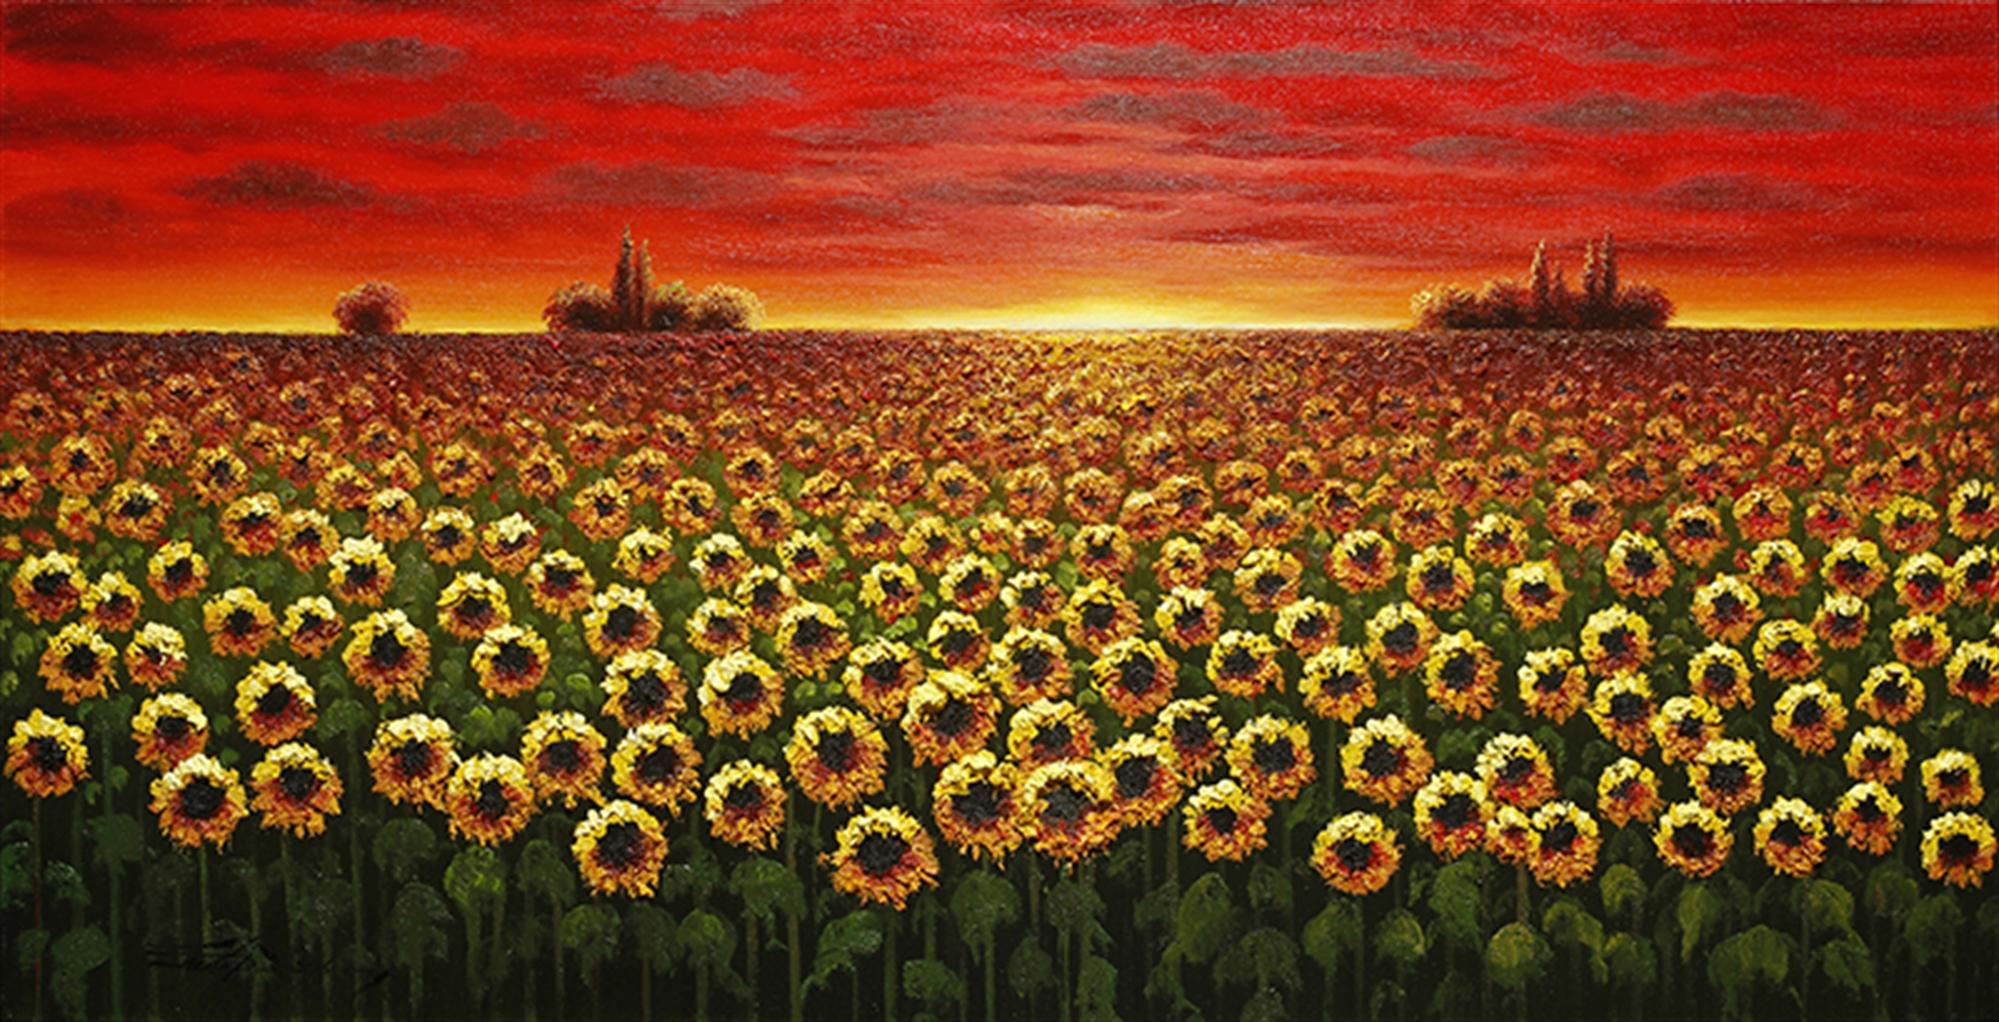 Soulful Skies by Mario Jung